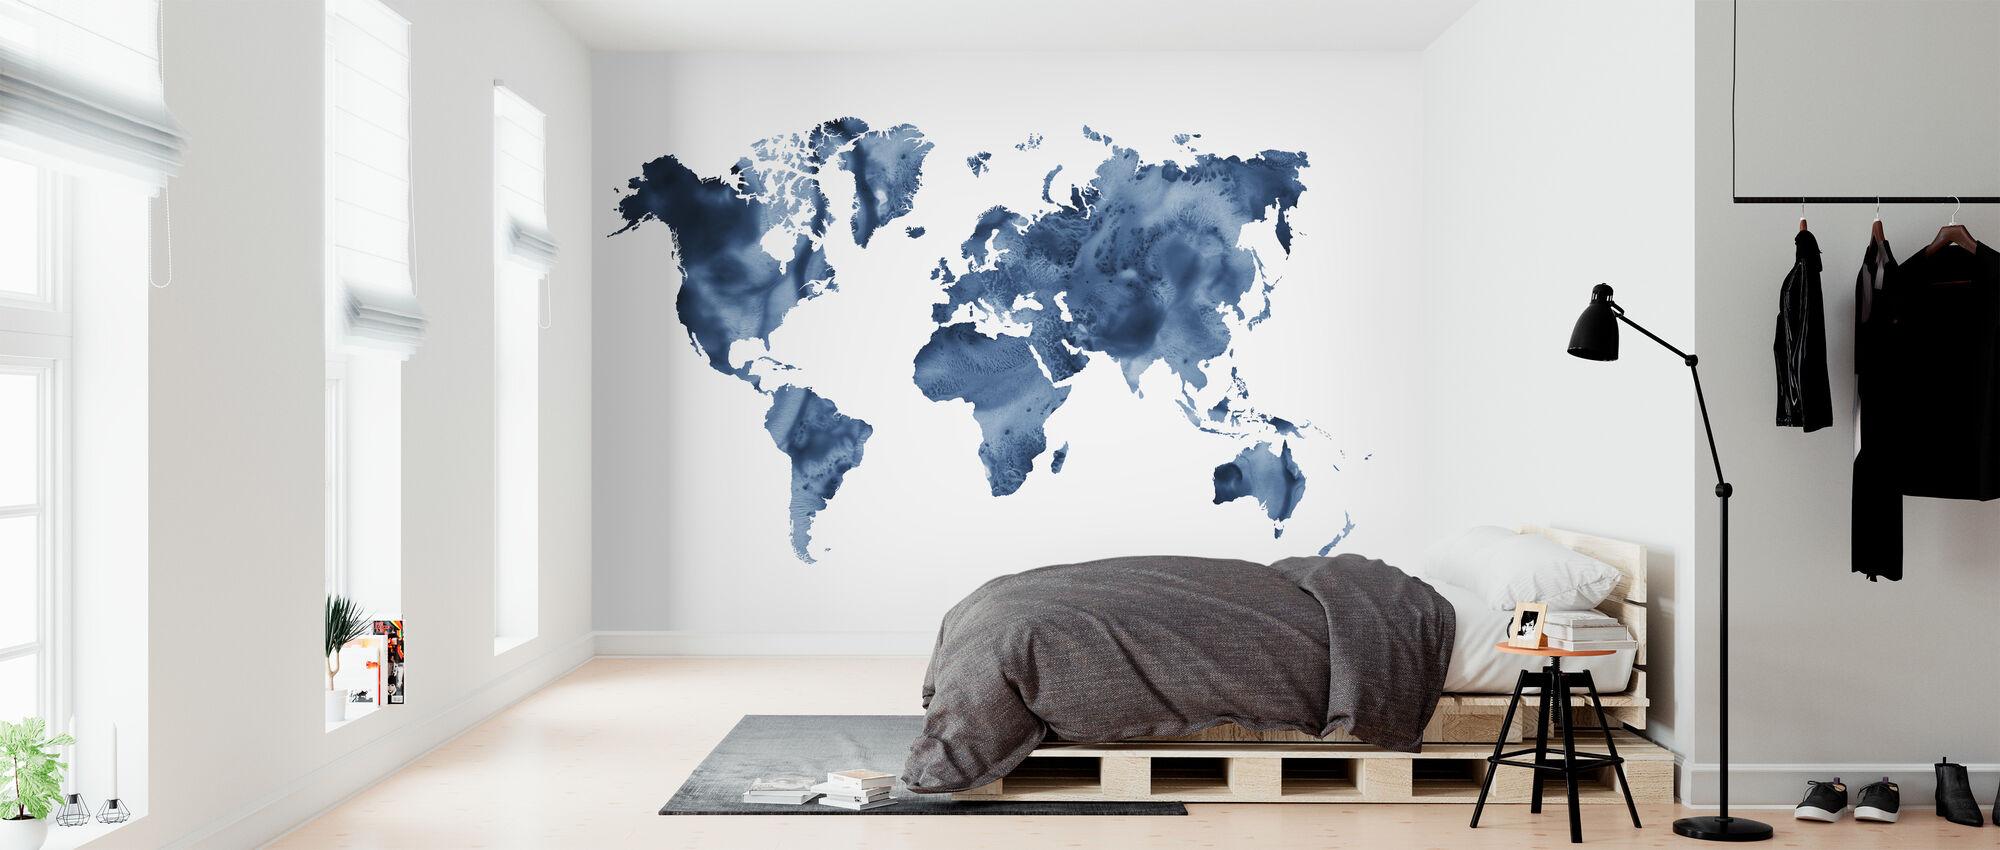 Watercolor World Navy Blue - Wallpaper - Bedroom